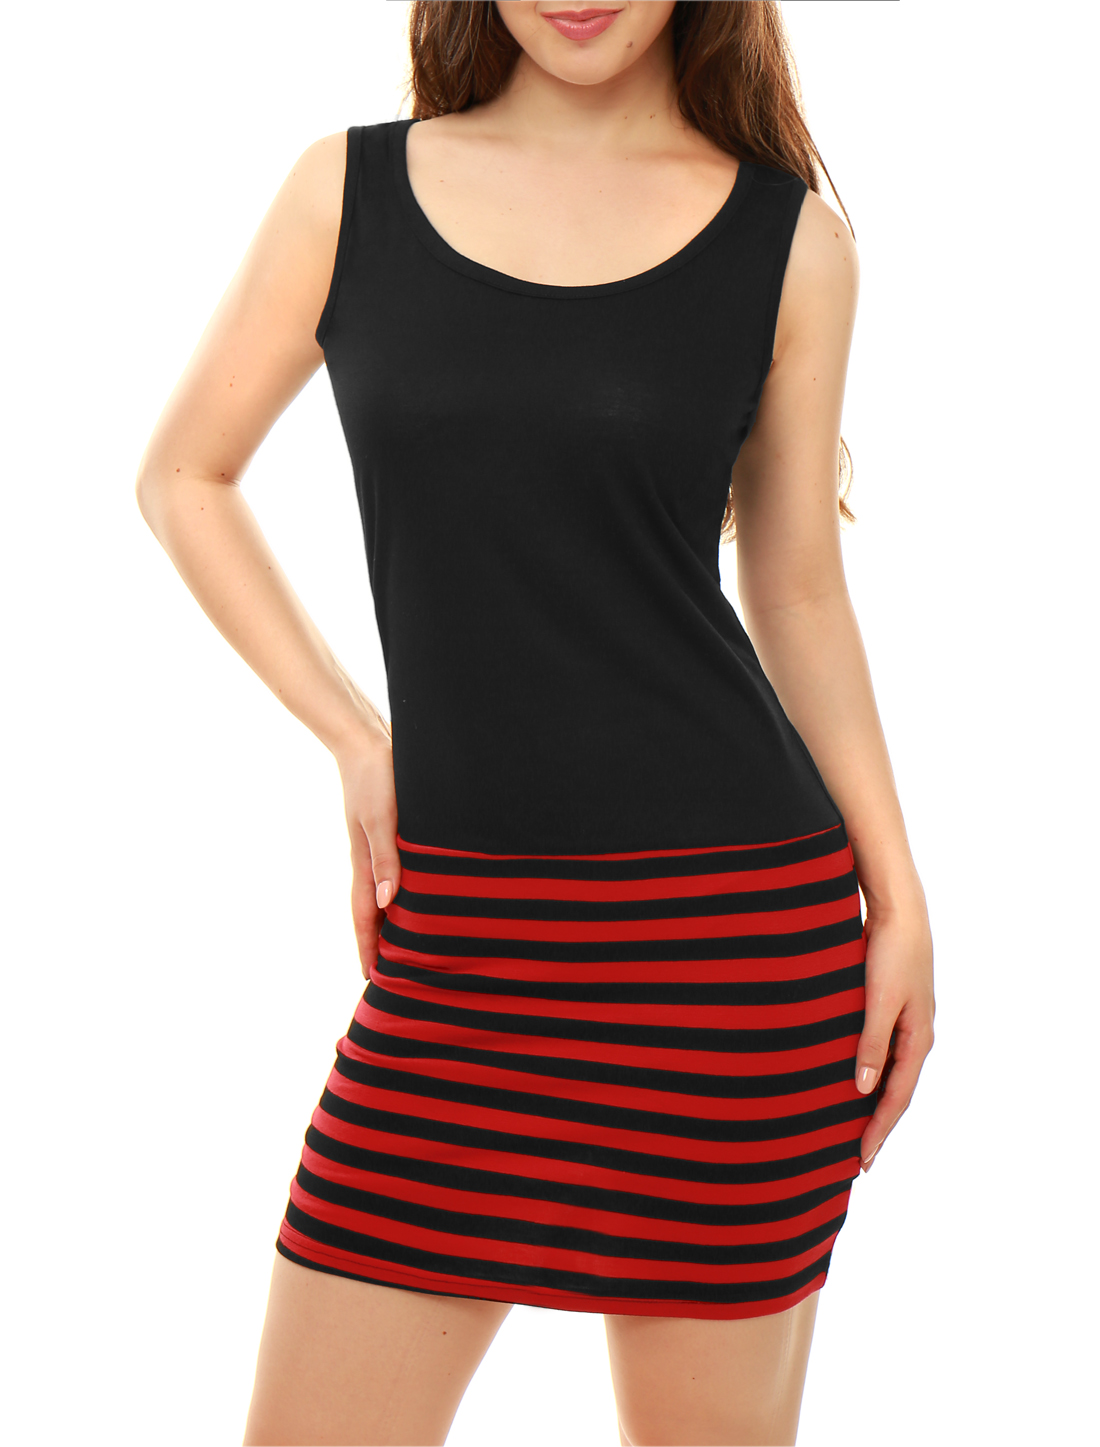 Pullover Black Red Stripes Pattern Slim Fit Mini Dress for Lady M